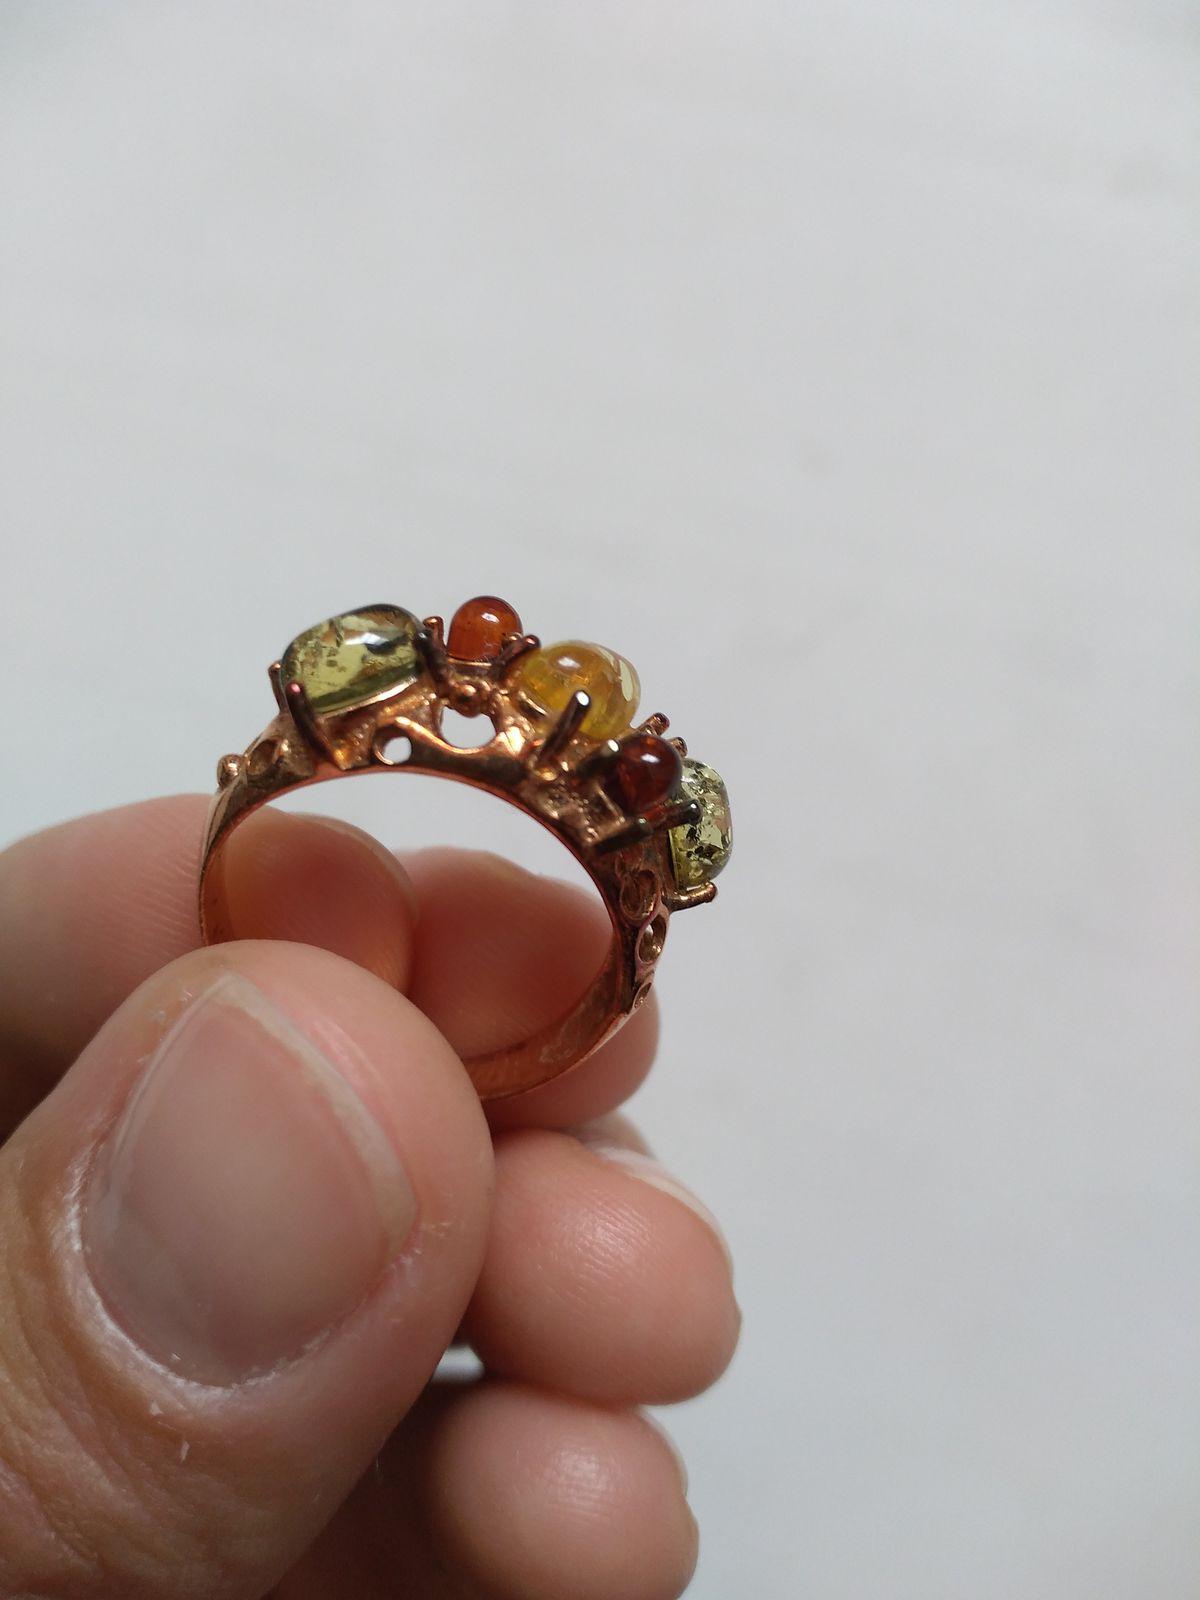 Первоначально красивое кольцо